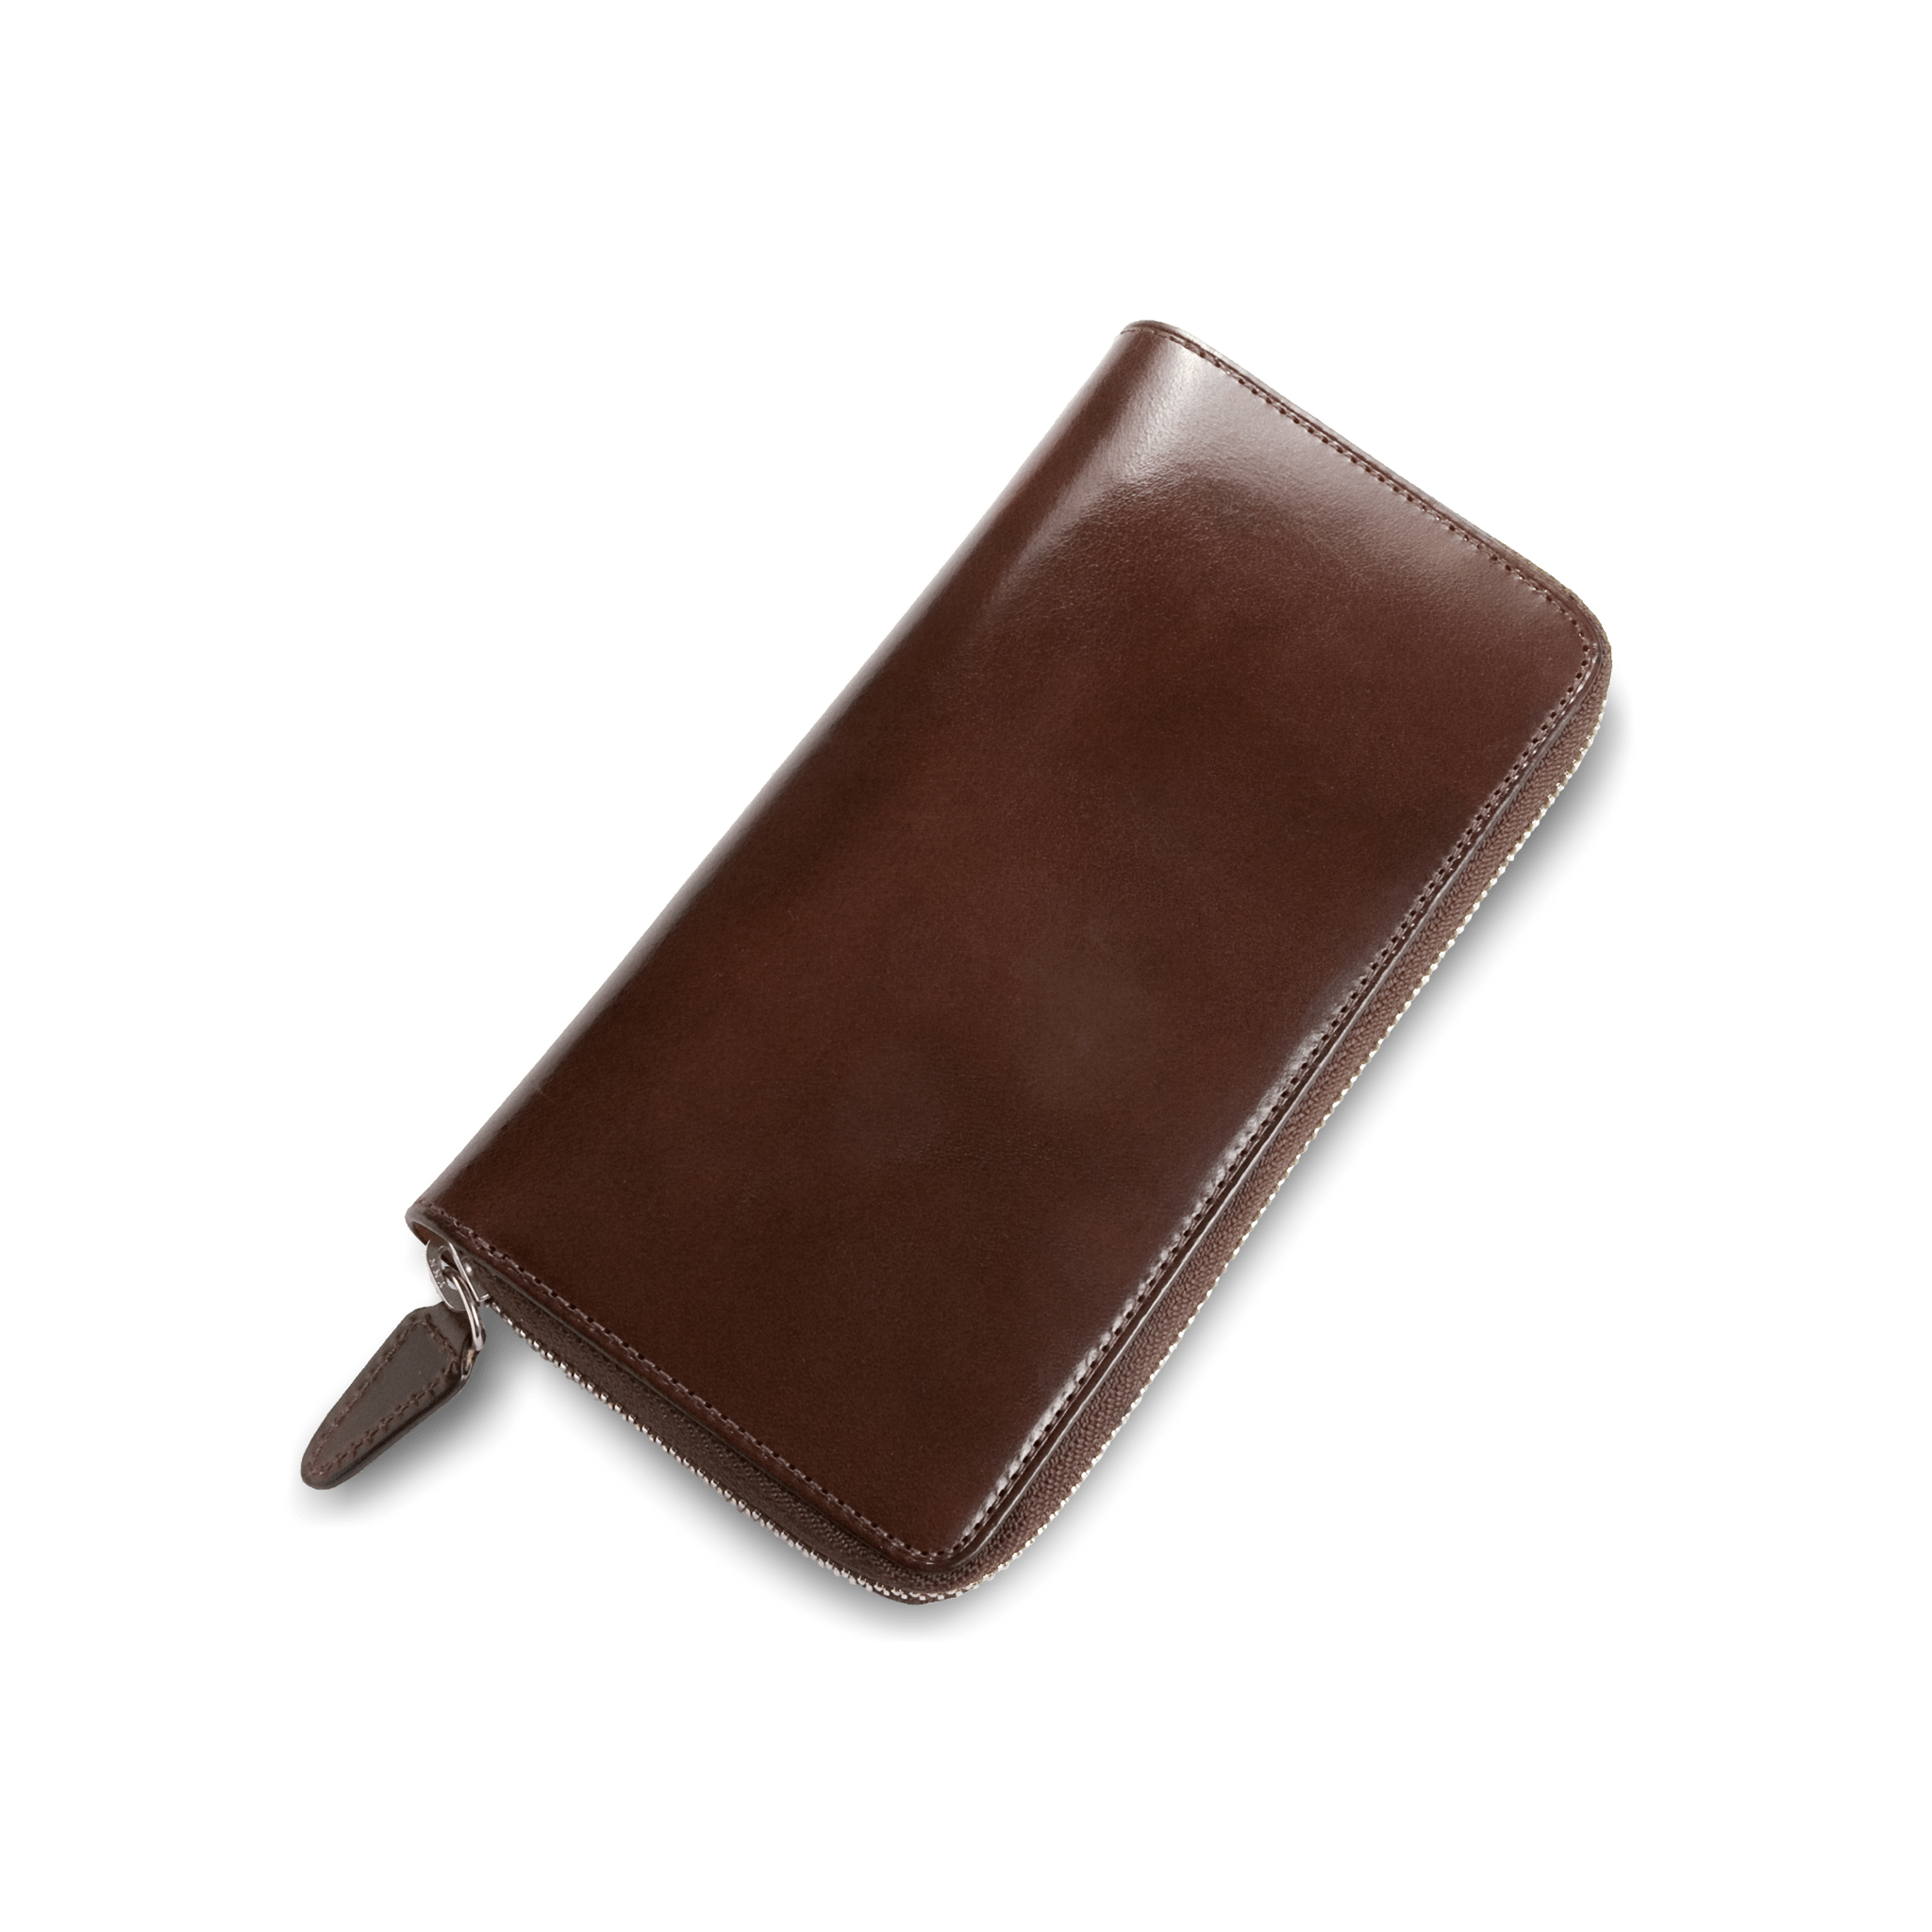 Il Bussetto Il Bussetto Horizontal Zip Wallet - Multiple Colors